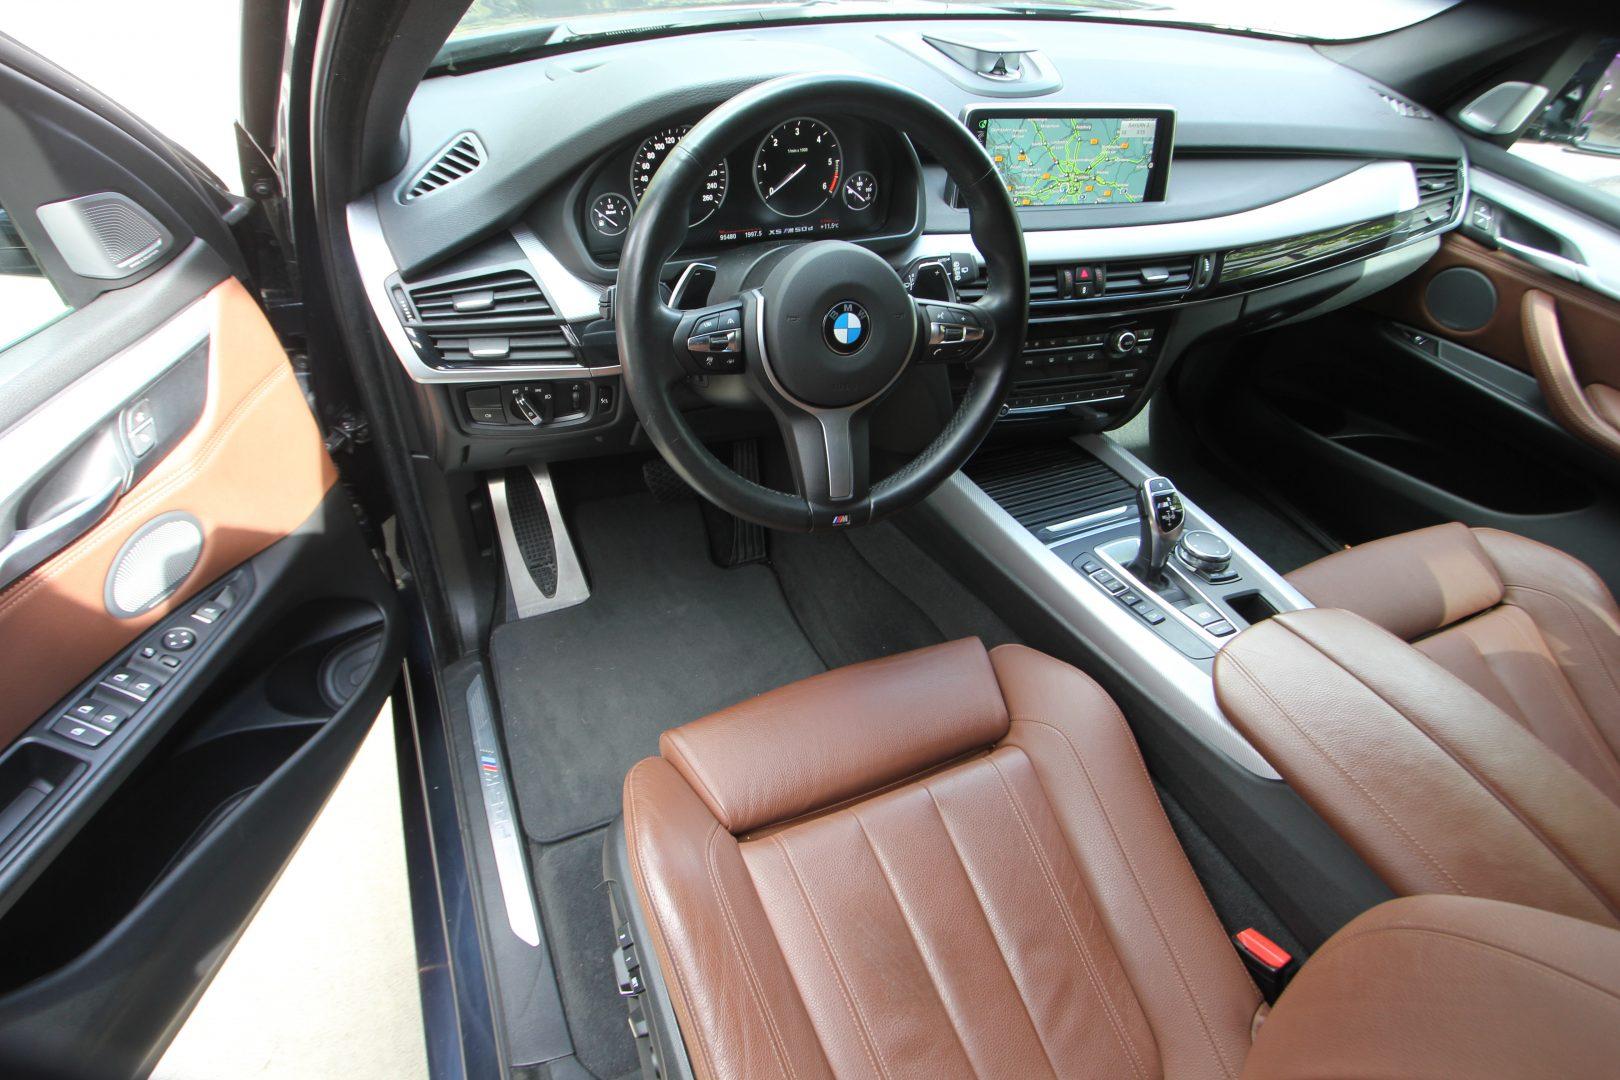 AIL BMW X5 M50d Bang & Olufsen Panorama RSE 3